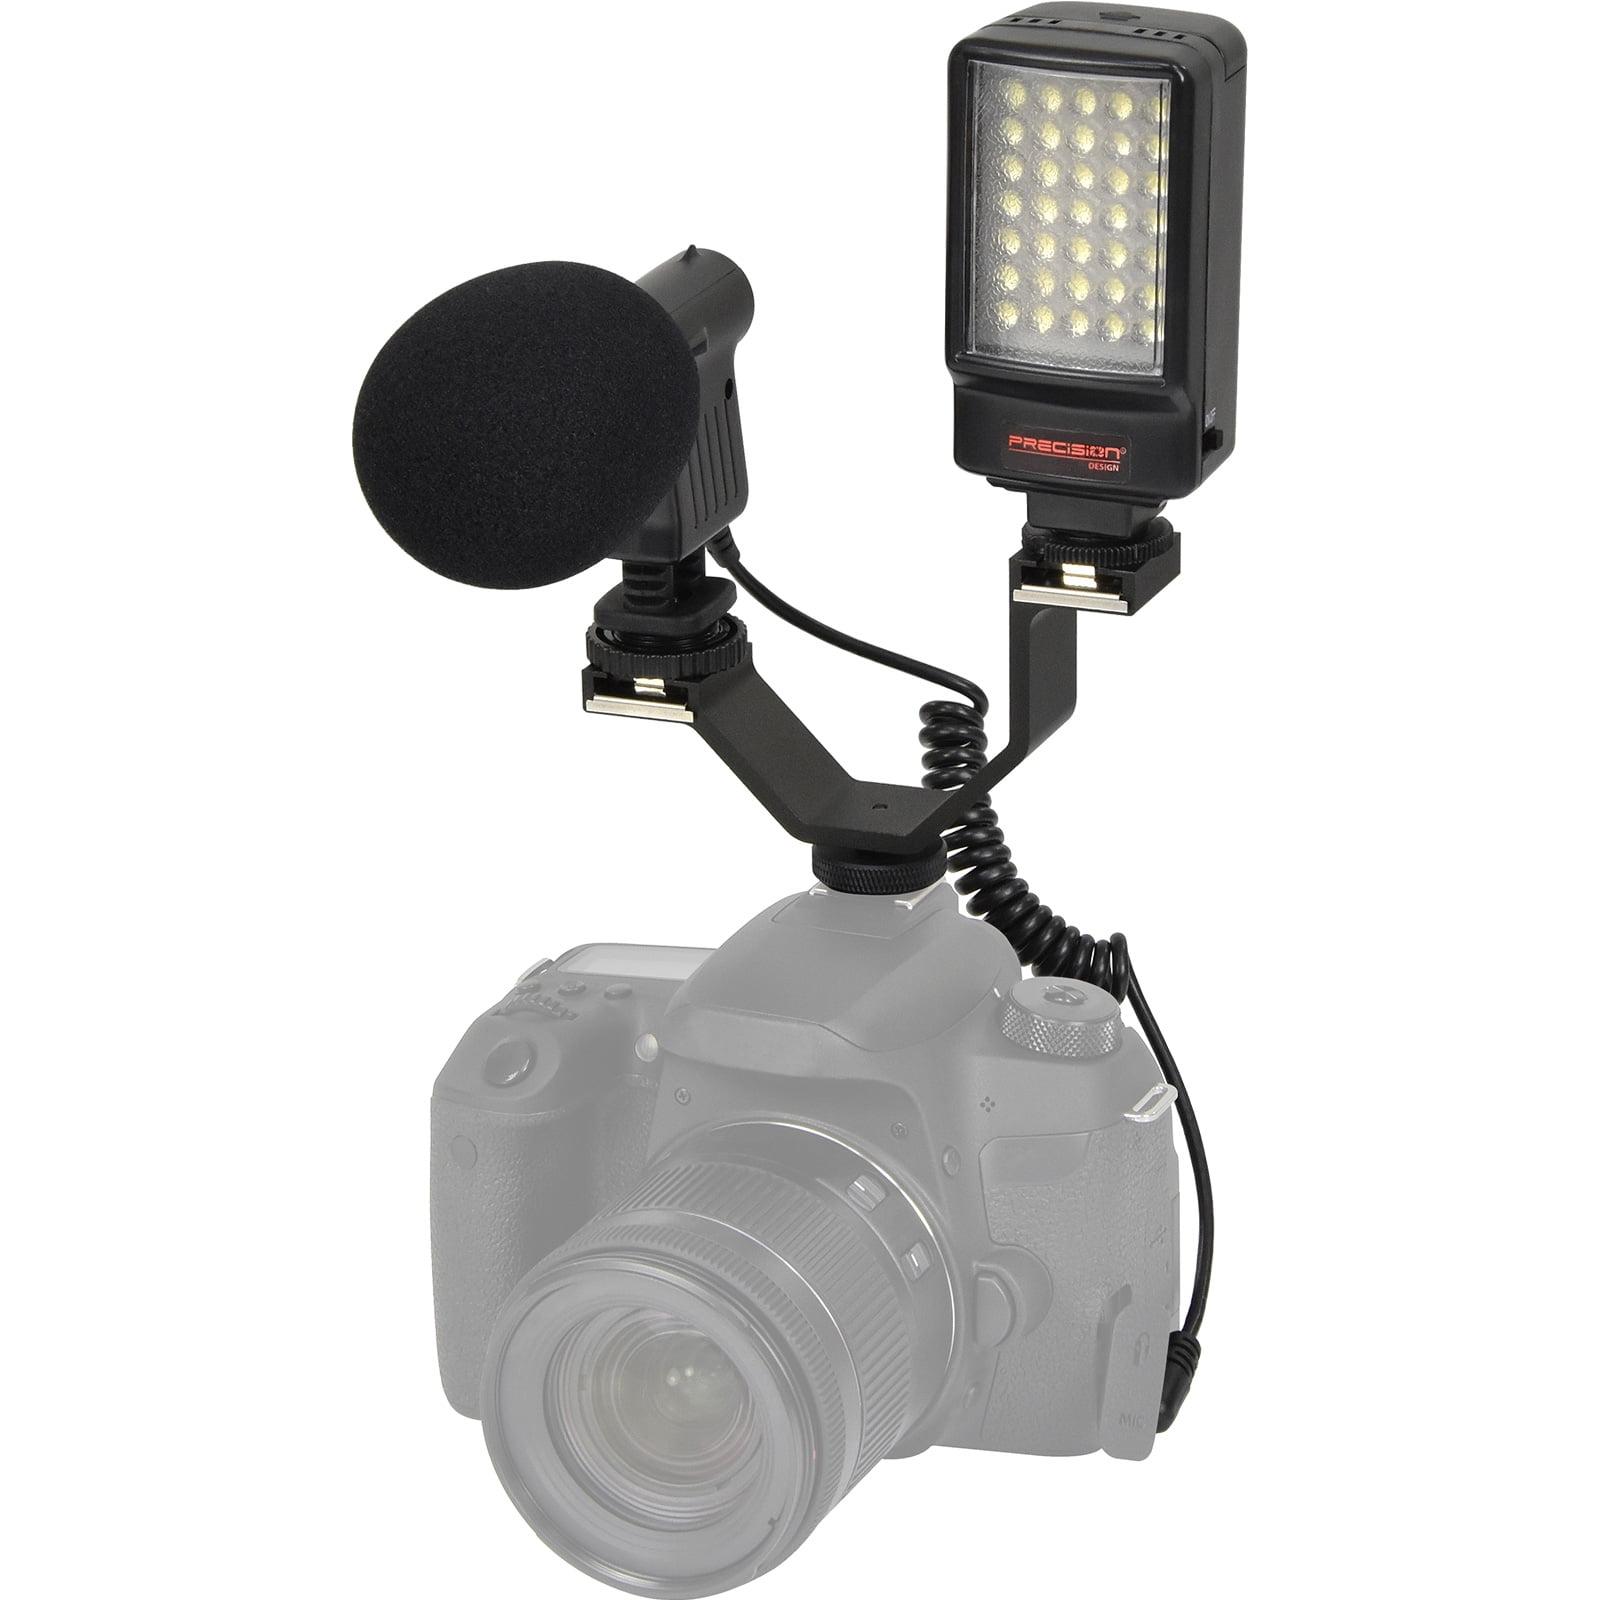 Precision Design Digital Camera / Camcorder LED Video Light with Bracket + Microphone + Dual Shoe Bracket Kit